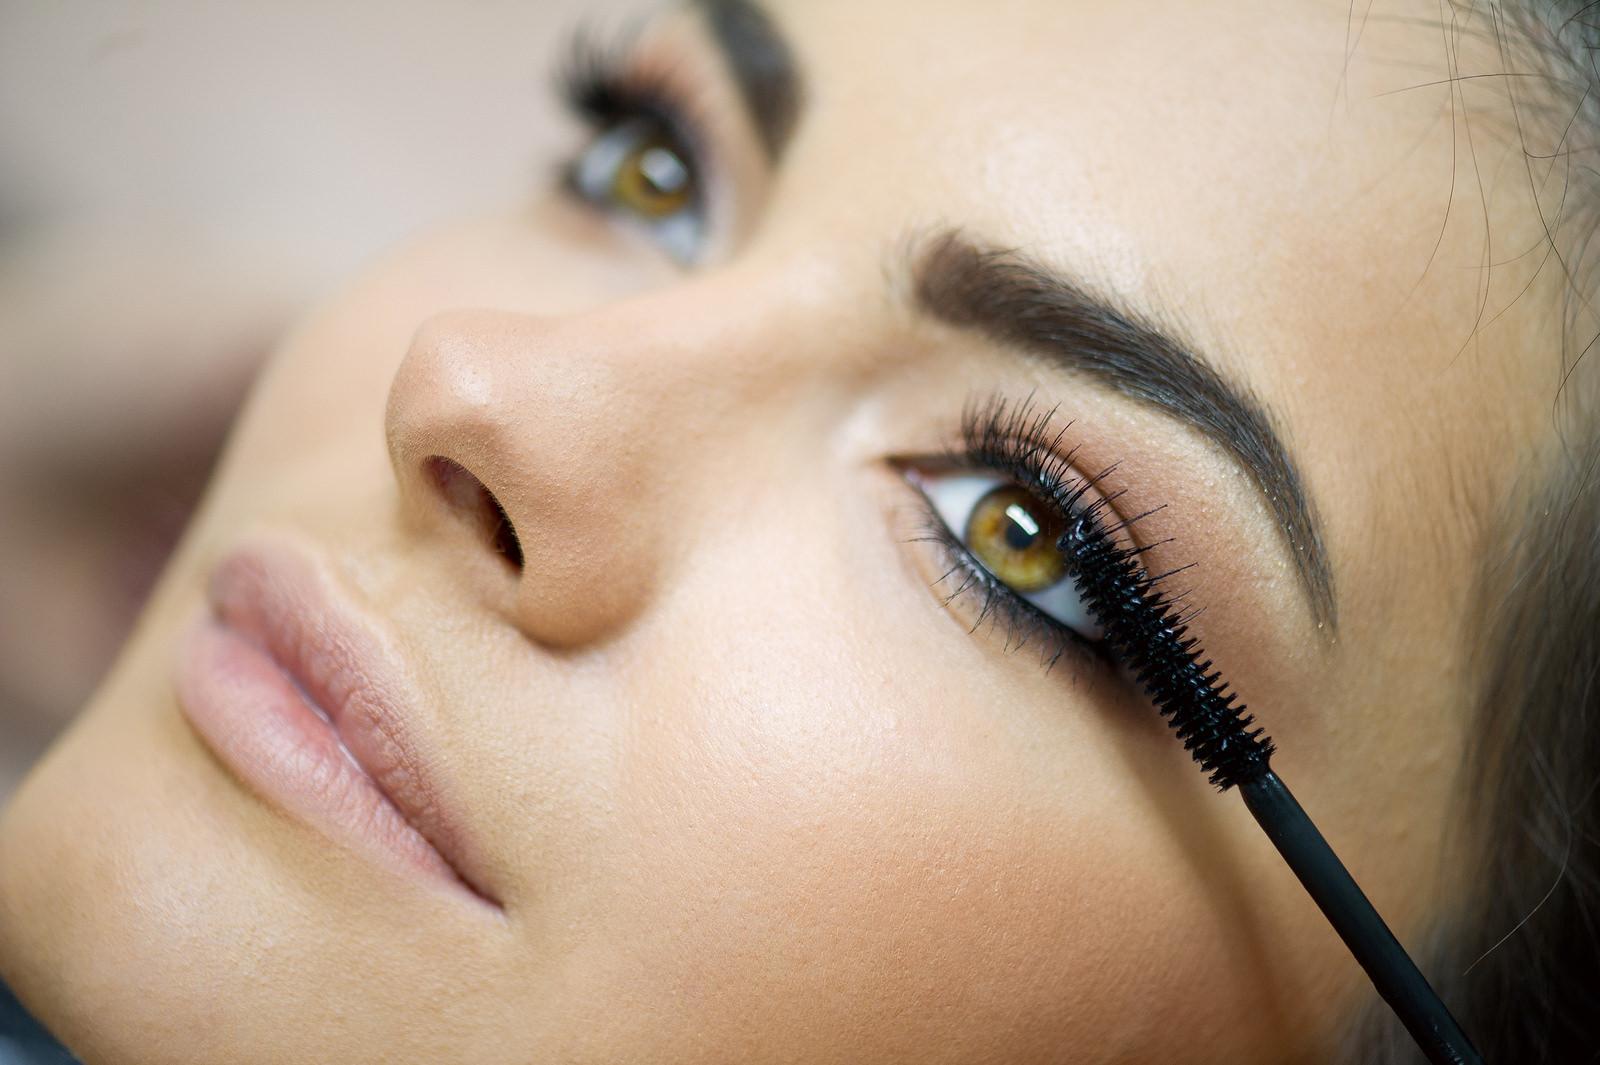 mascara-application